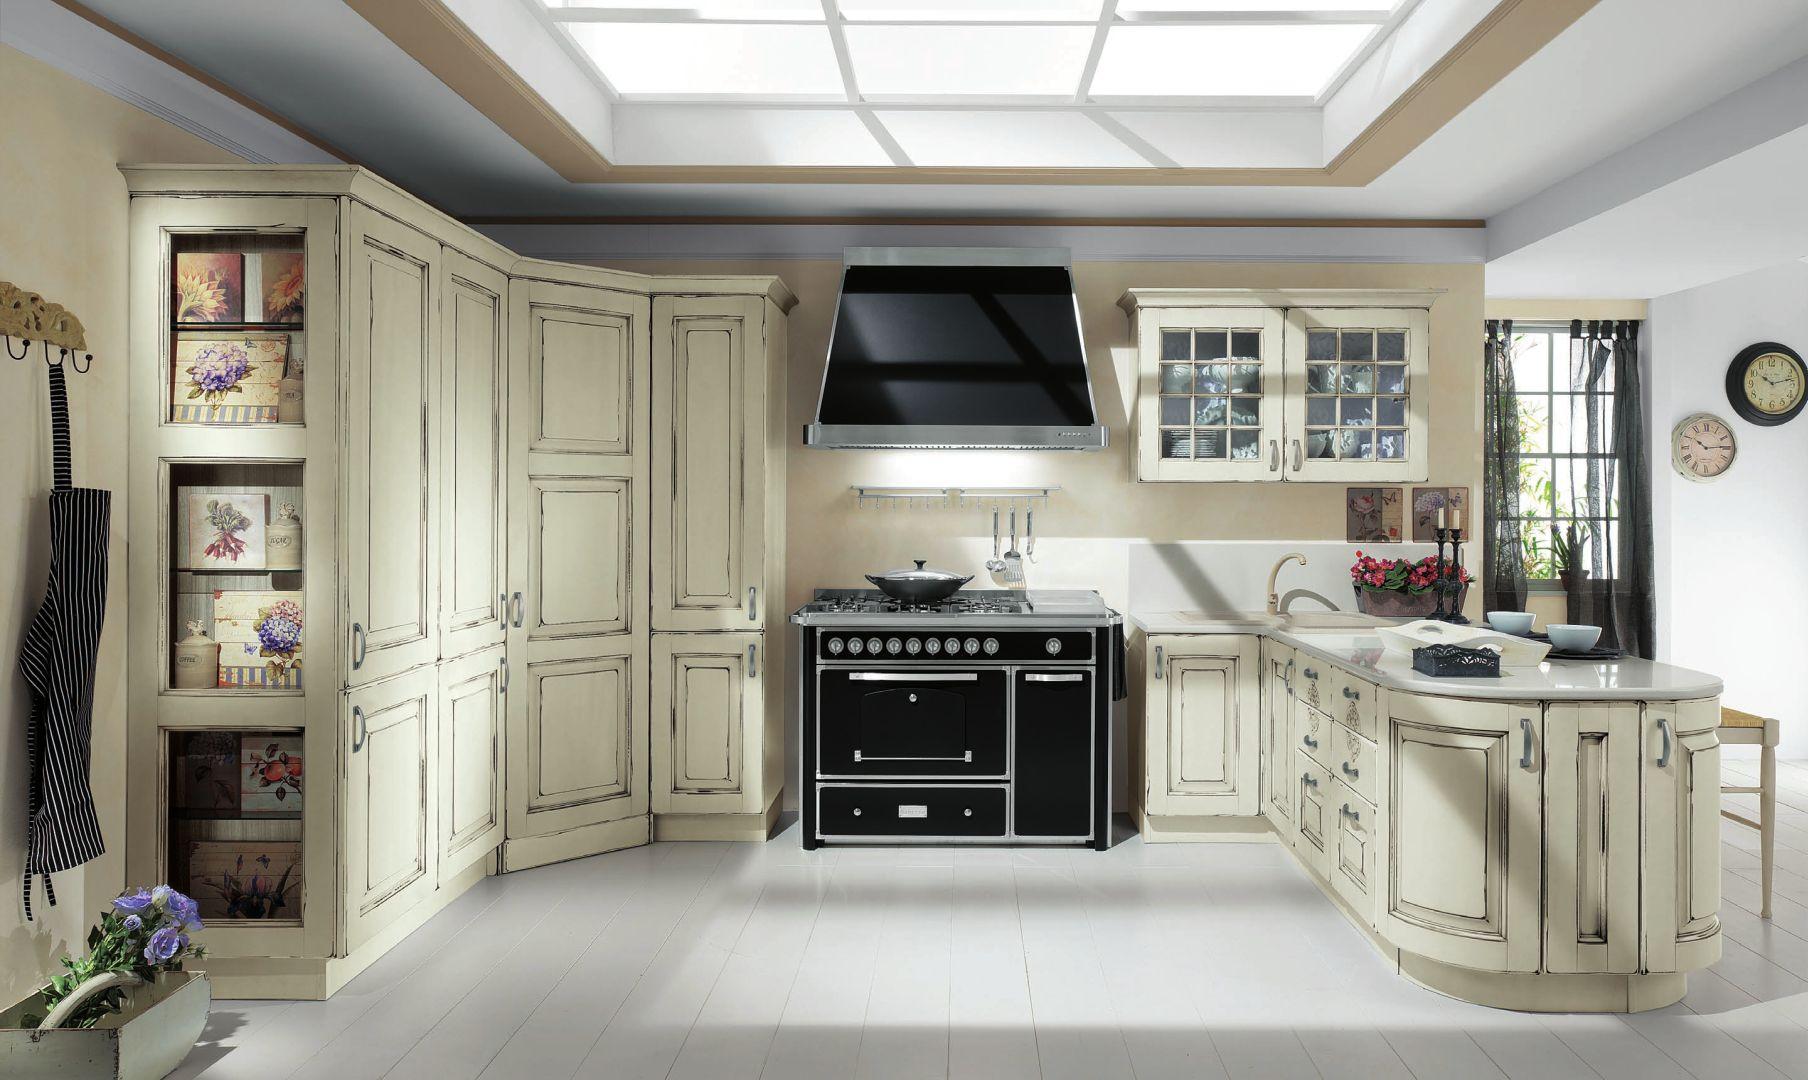 EVA κουζινα μασιφ λευκή με μαύρη πατίνα